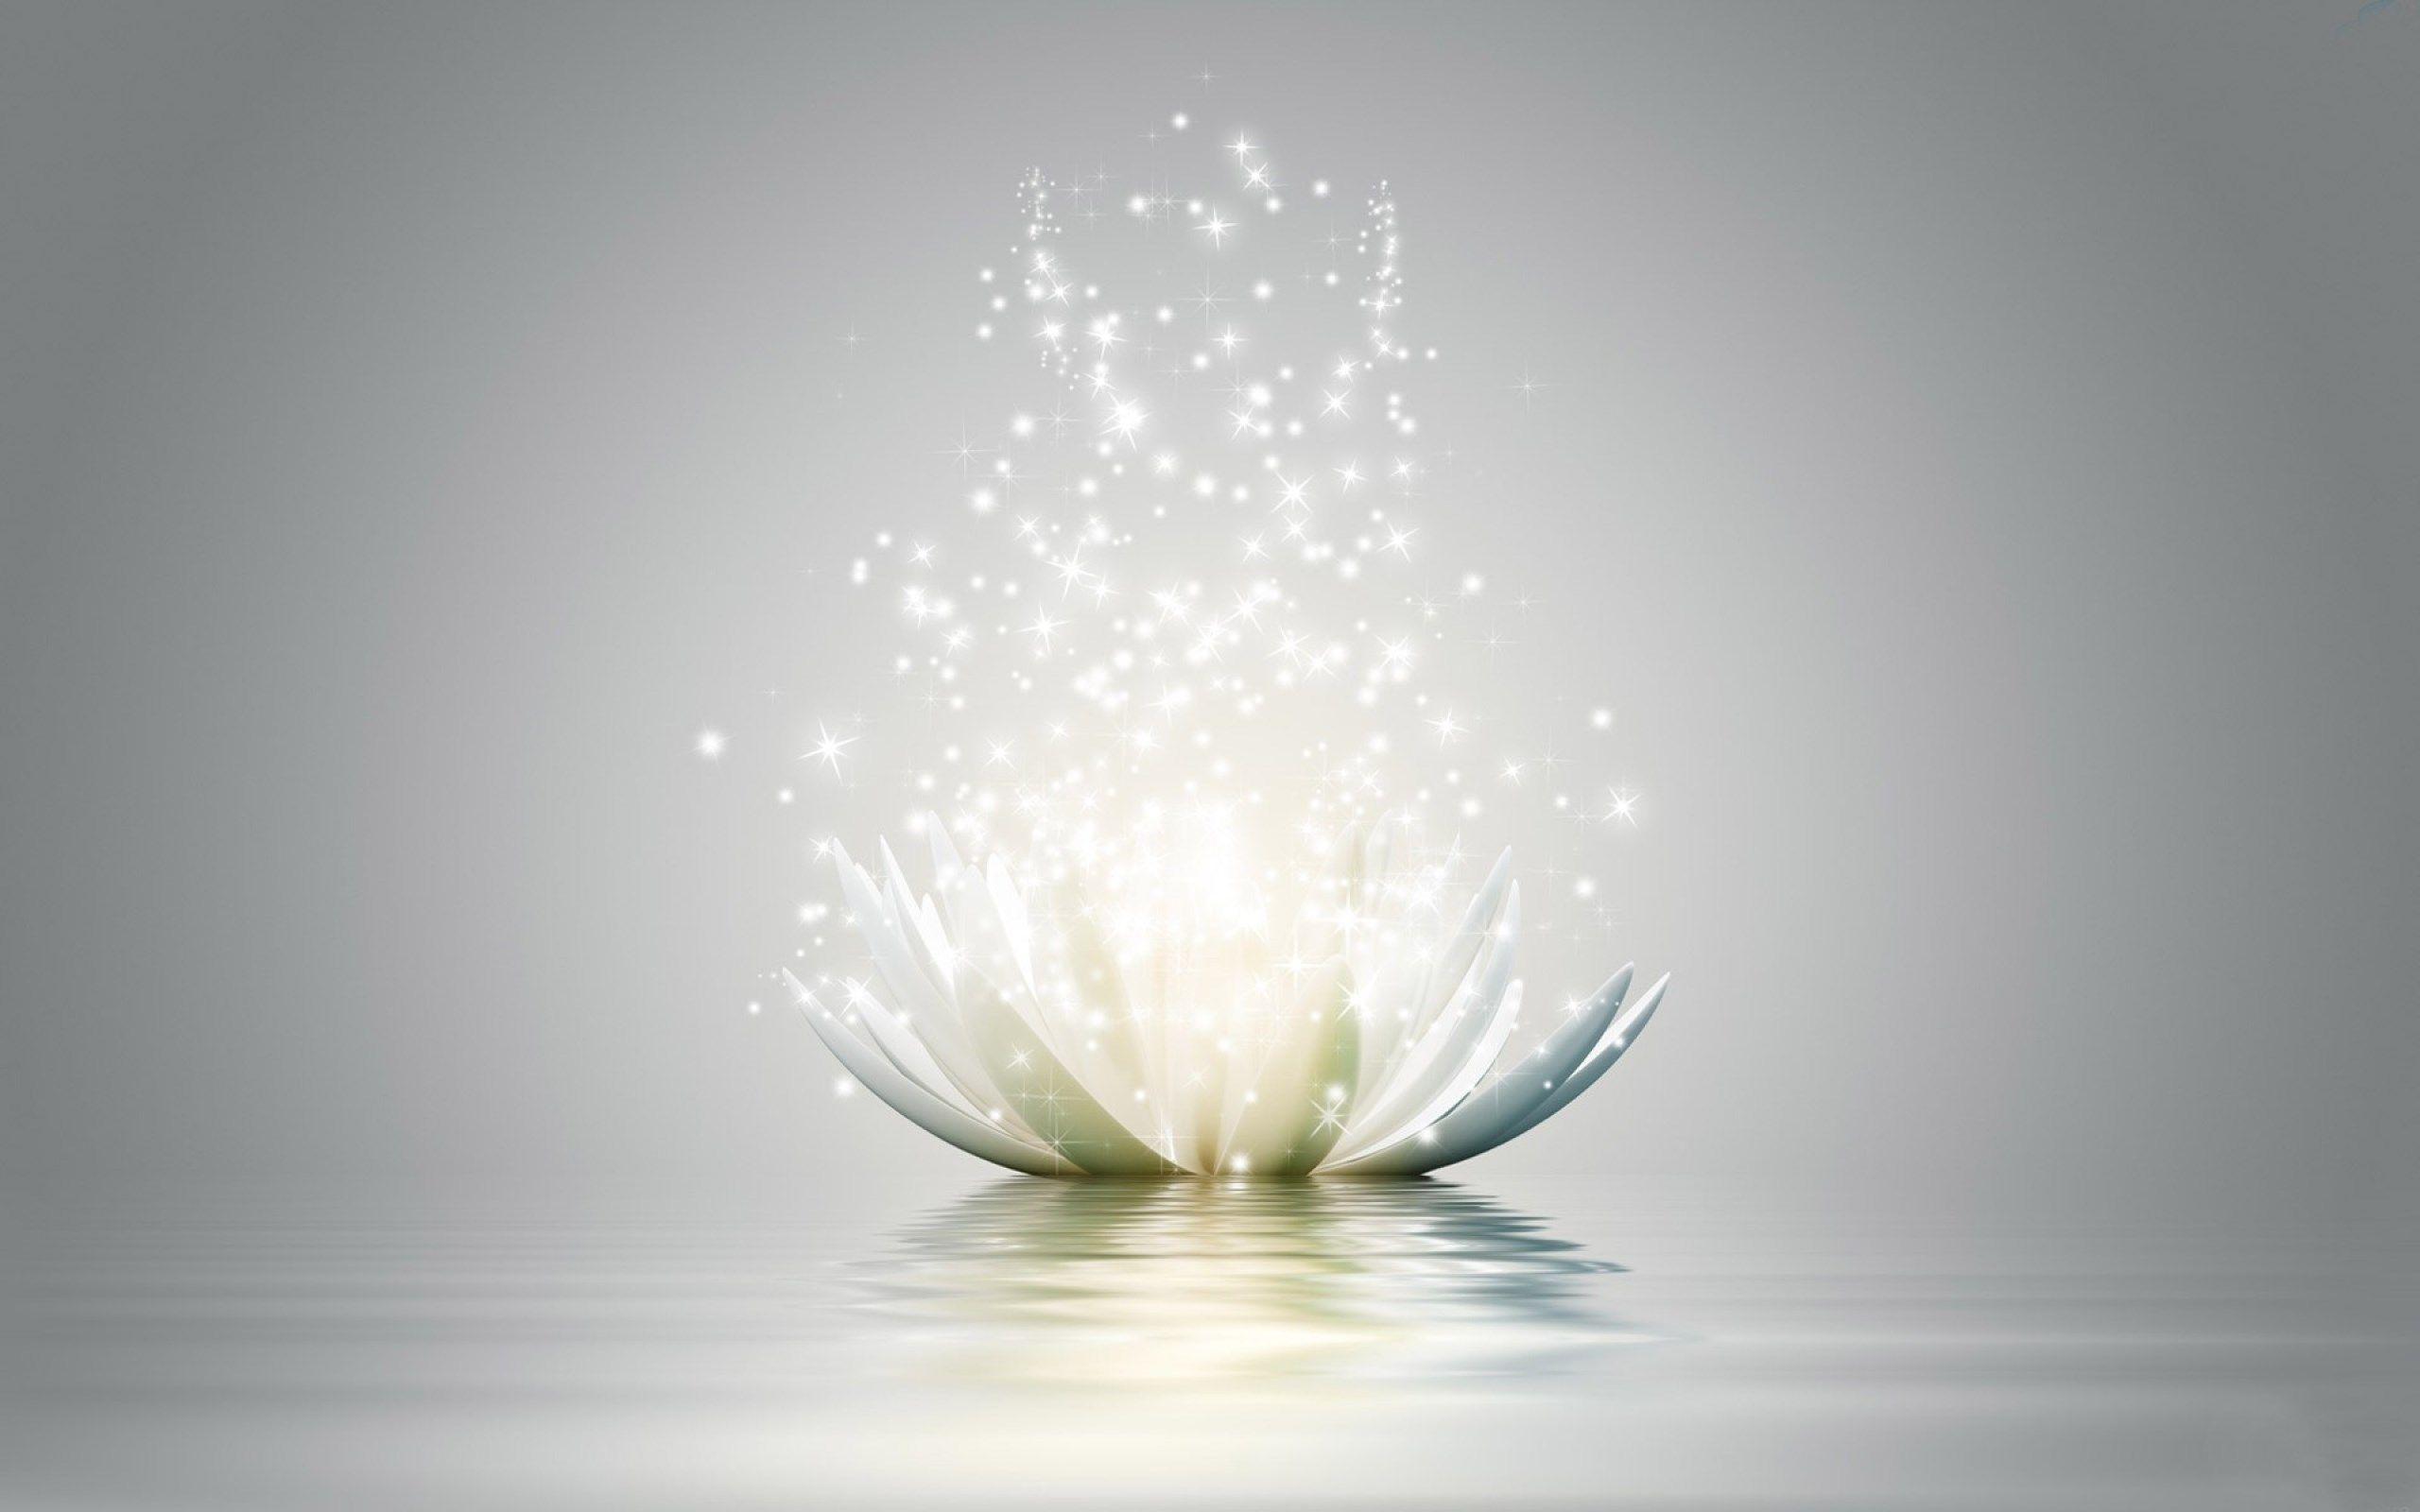 2560x1600 Widescreen Wallpaper Lotus Lotus Flower Wallpaper